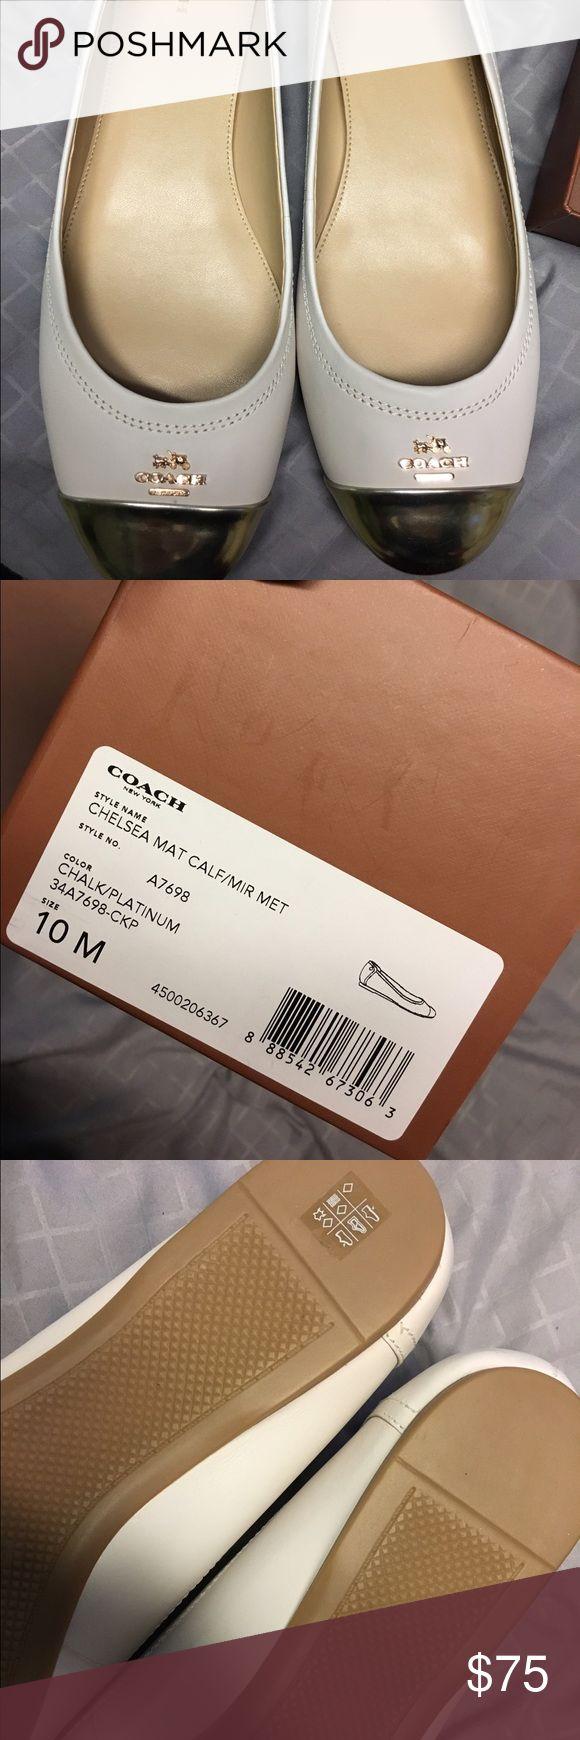 Coach flats BNIB Brand new never been worn tan/gold flats coach Coach Shoes Flats & Loafers